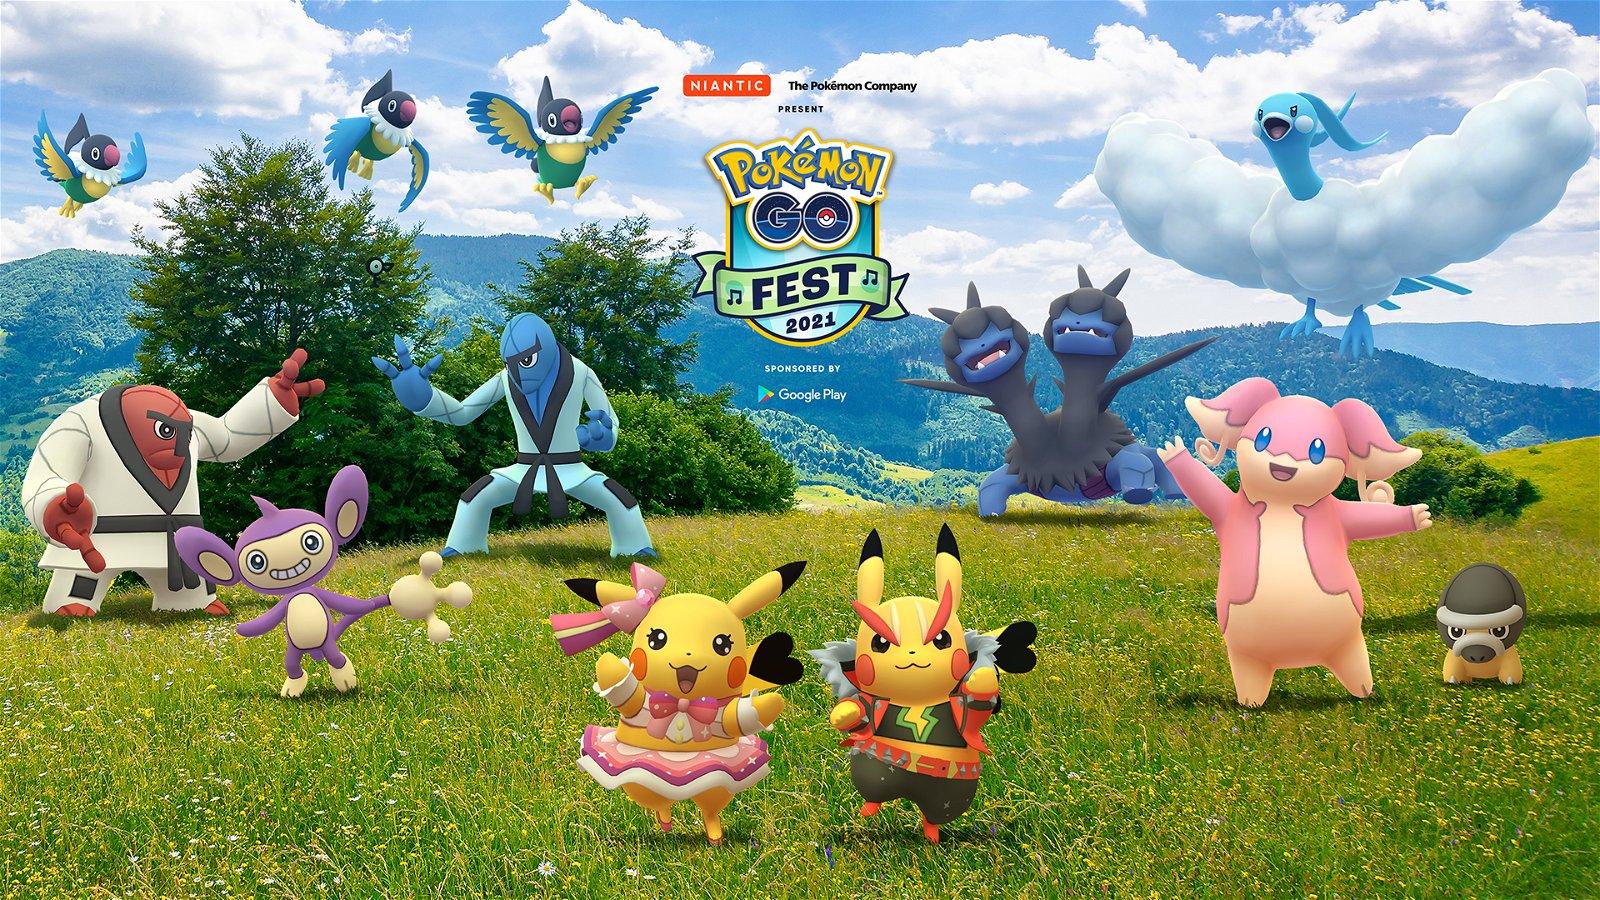 Pokémon GO Fest 2021: What You Need To Know